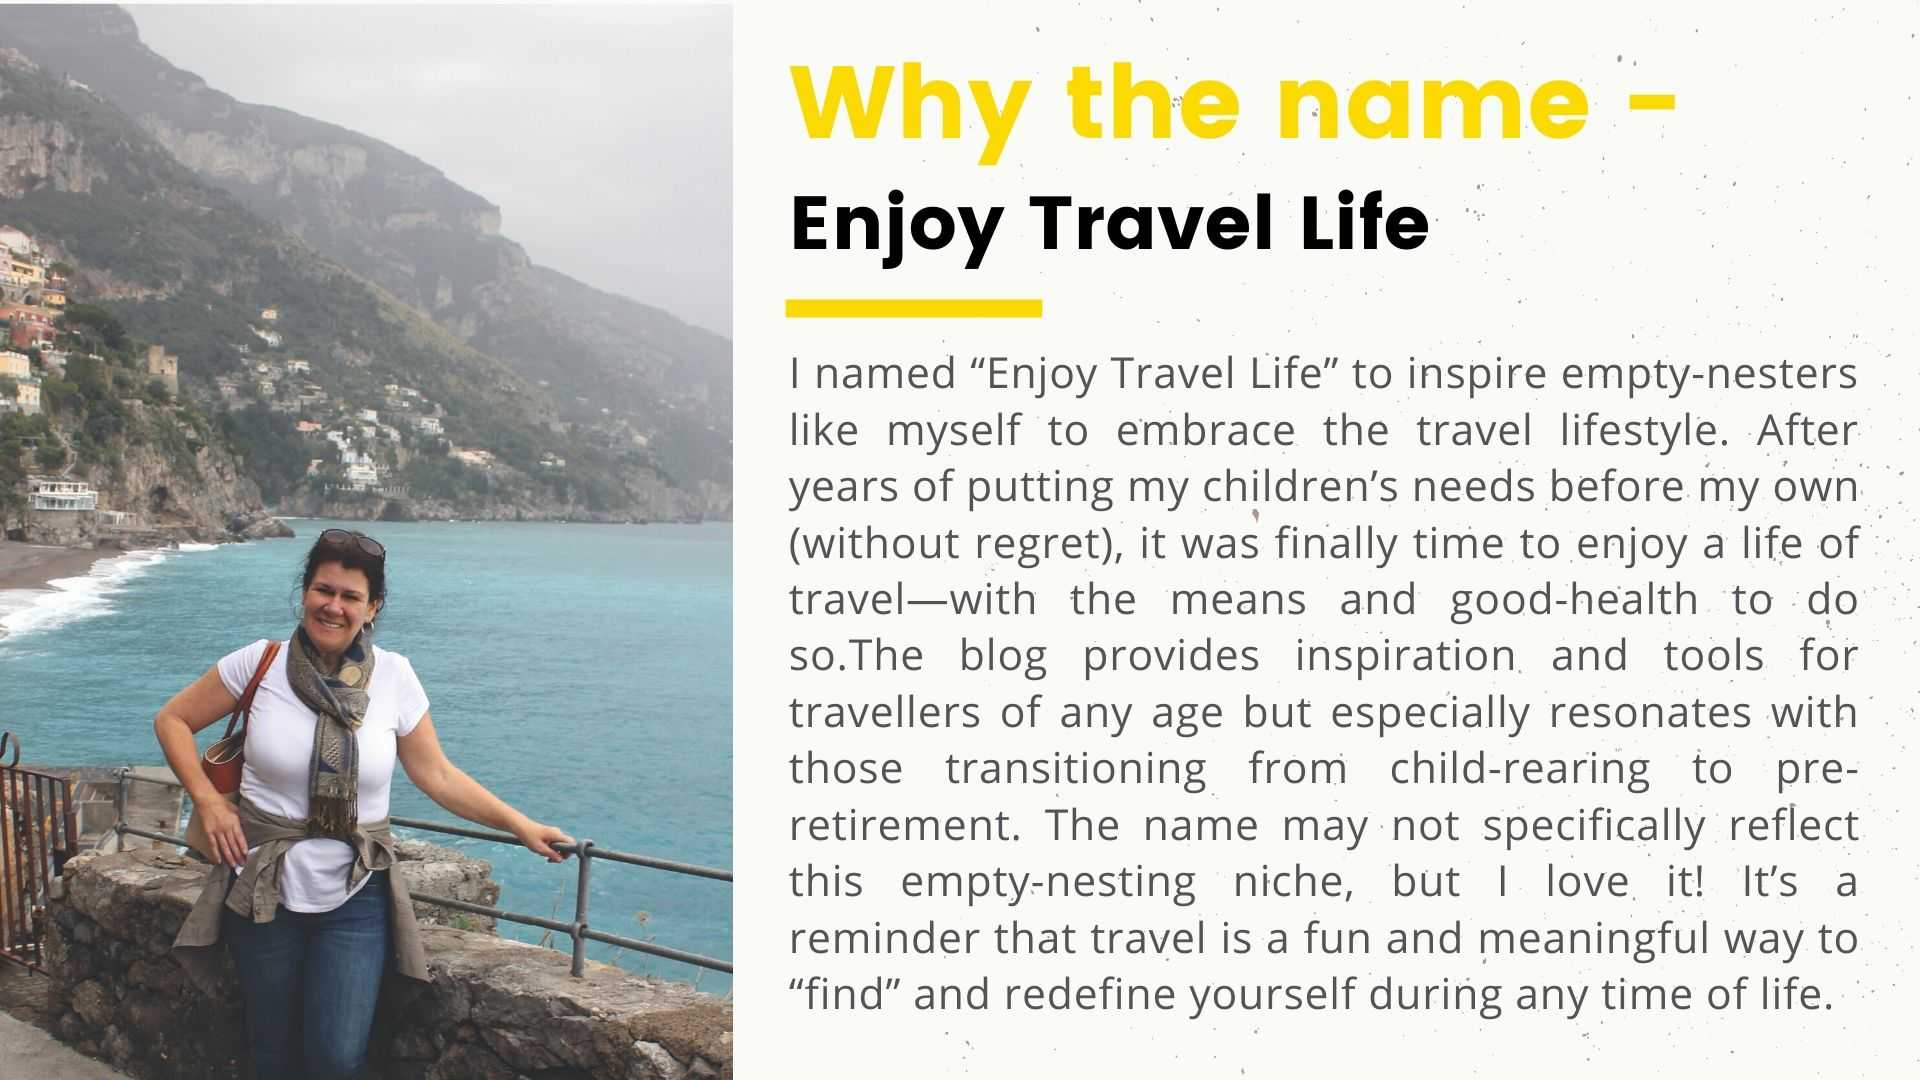 Enjoy Travel Life Blog